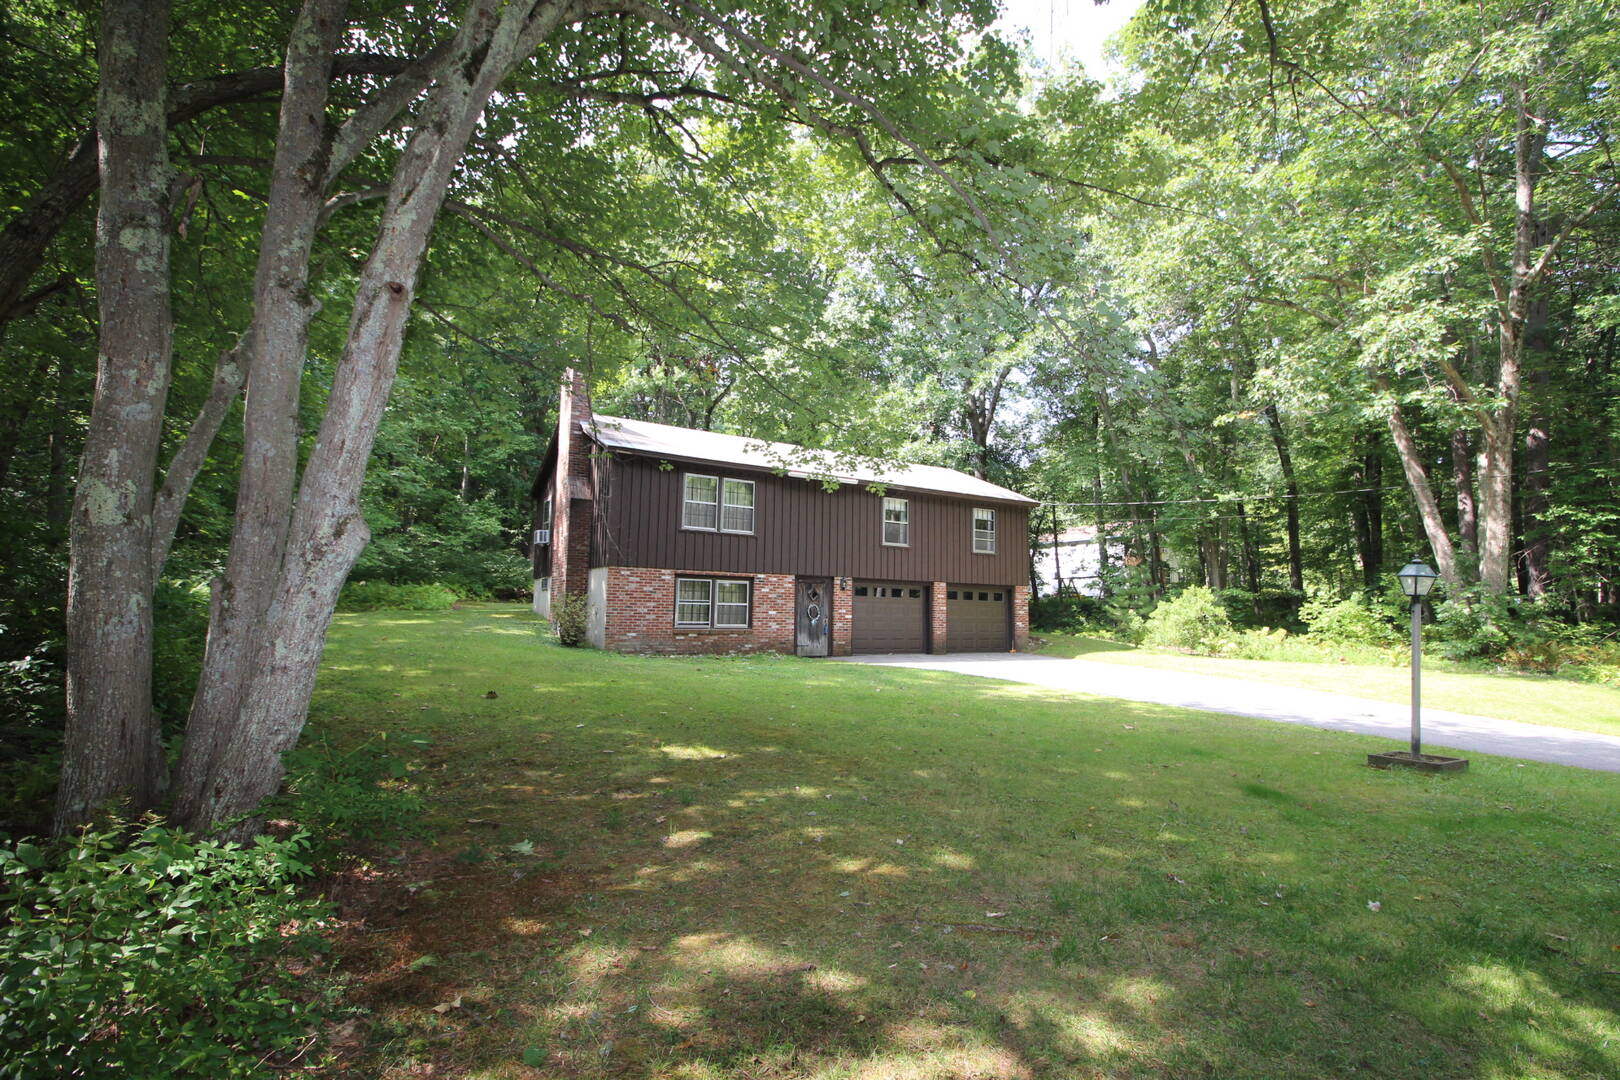 8 Woodcrest Avenue Hudson NH 03051 Hudson, NH 03051